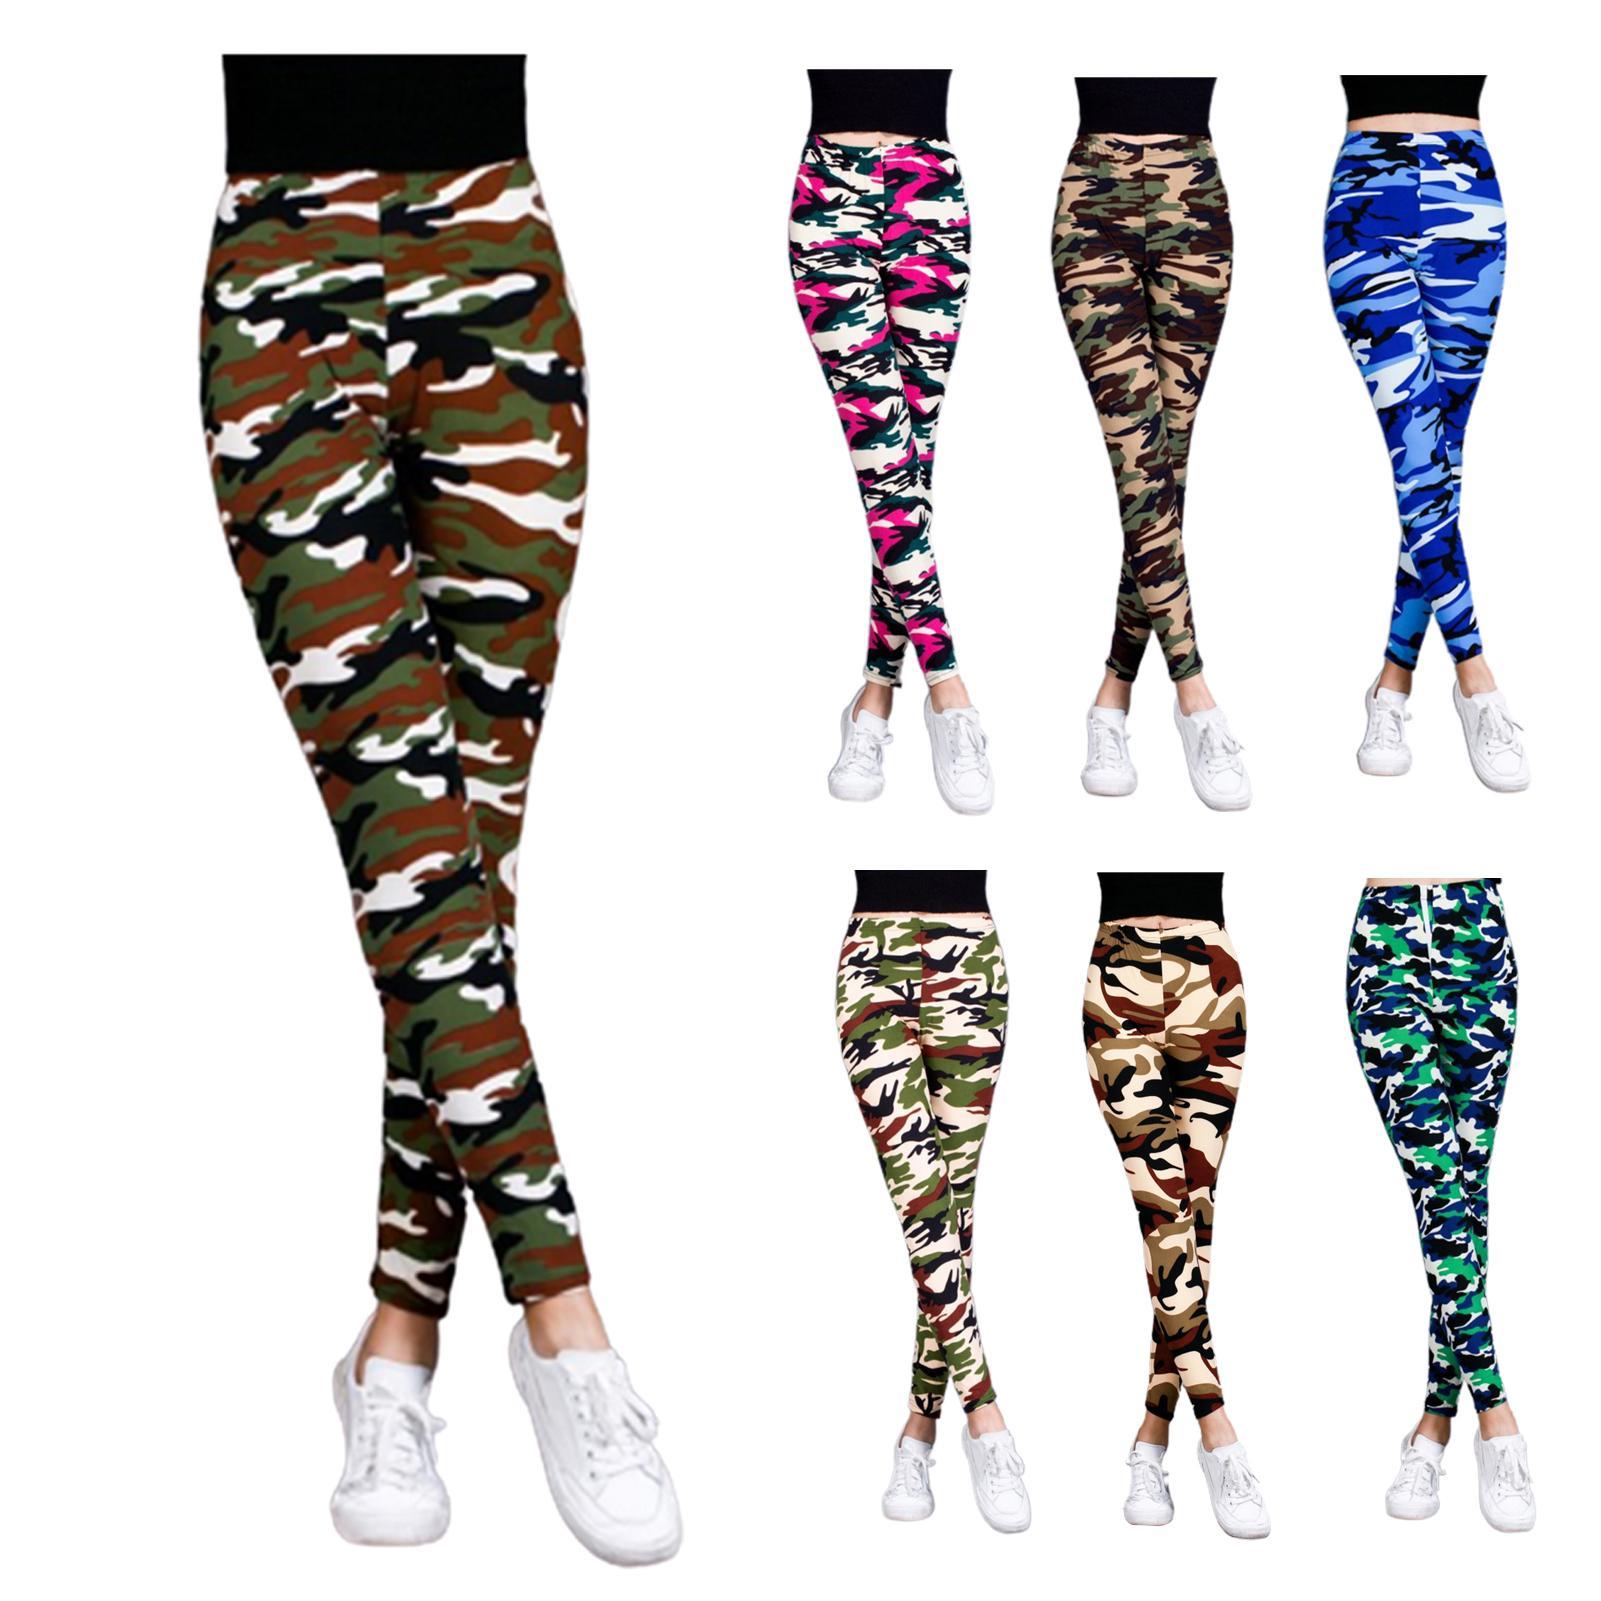 2020 new High quality Women Camouflage Printed Large Size High Waist Elastic Slim Ninth Pants Legging leggings crochet pants